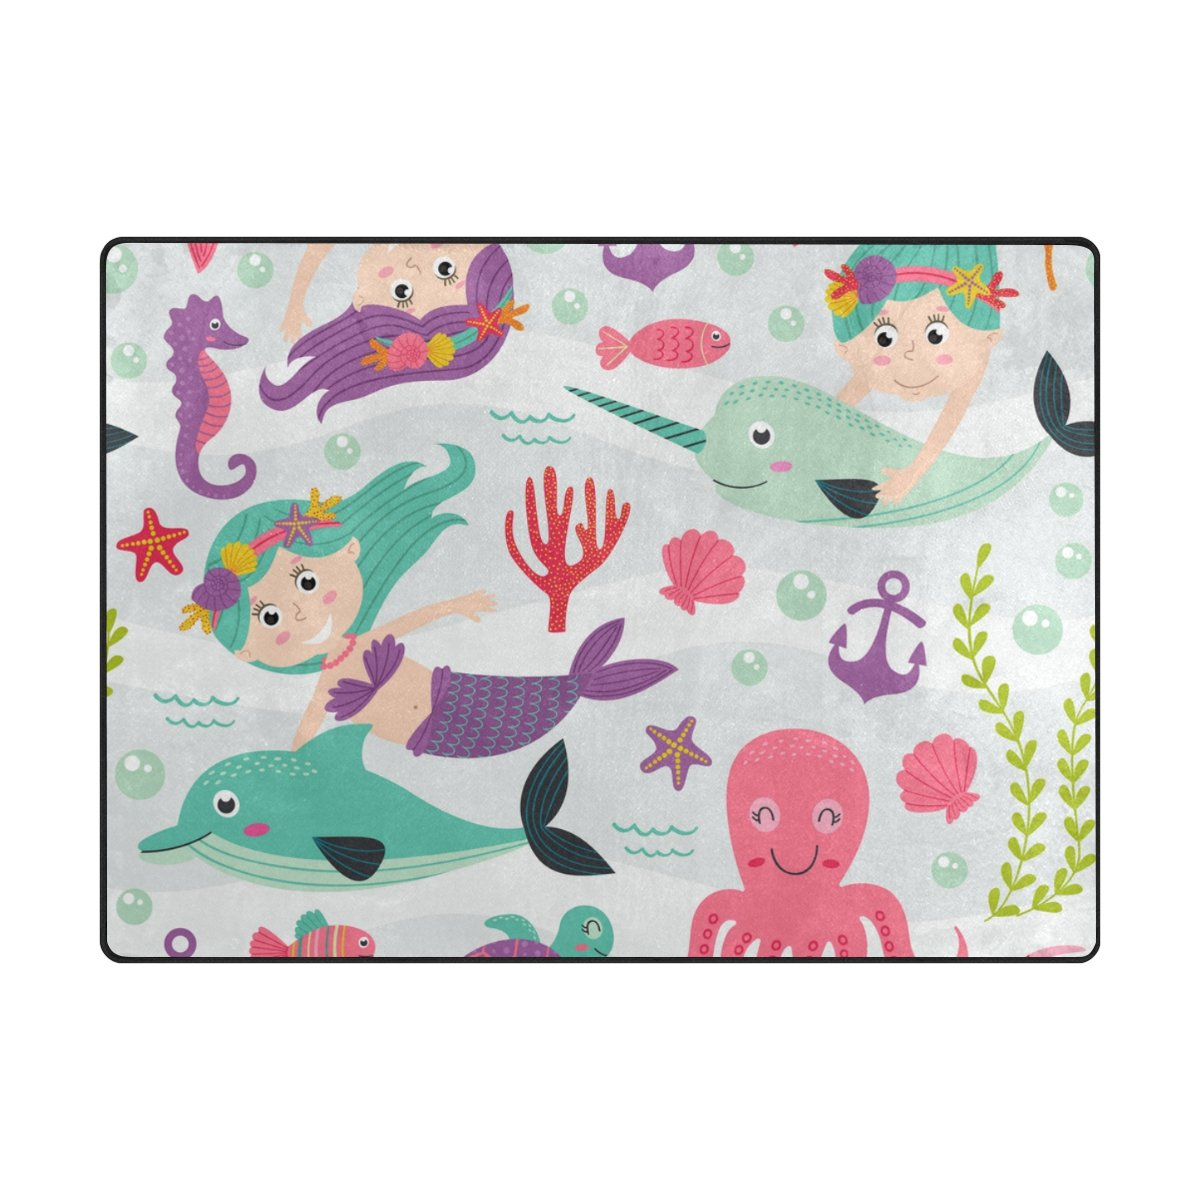 Vantaso Soft Foam Area Rugs Girls Mermaid Octopus Whale Non Slip Play Mats for Kids Boys Girls Playing Room Living Room 63x48 inch by Vantaso